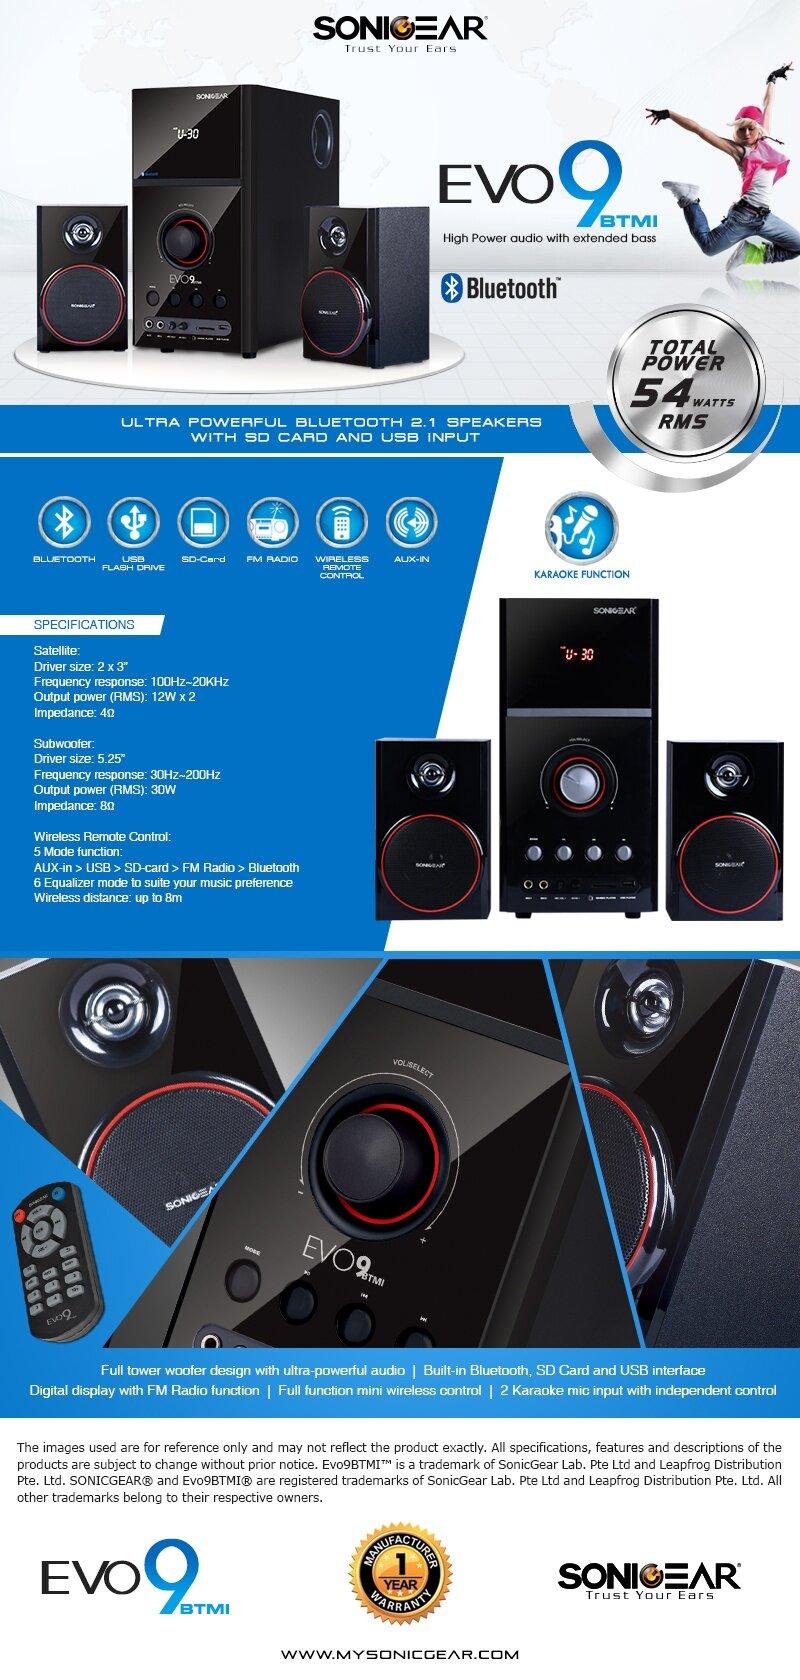 sonicgear evo 9 btmi bluetooth multimedia speaker with bluetooth fm radio sd slot usb slot. Black Bedroom Furniture Sets. Home Design Ideas